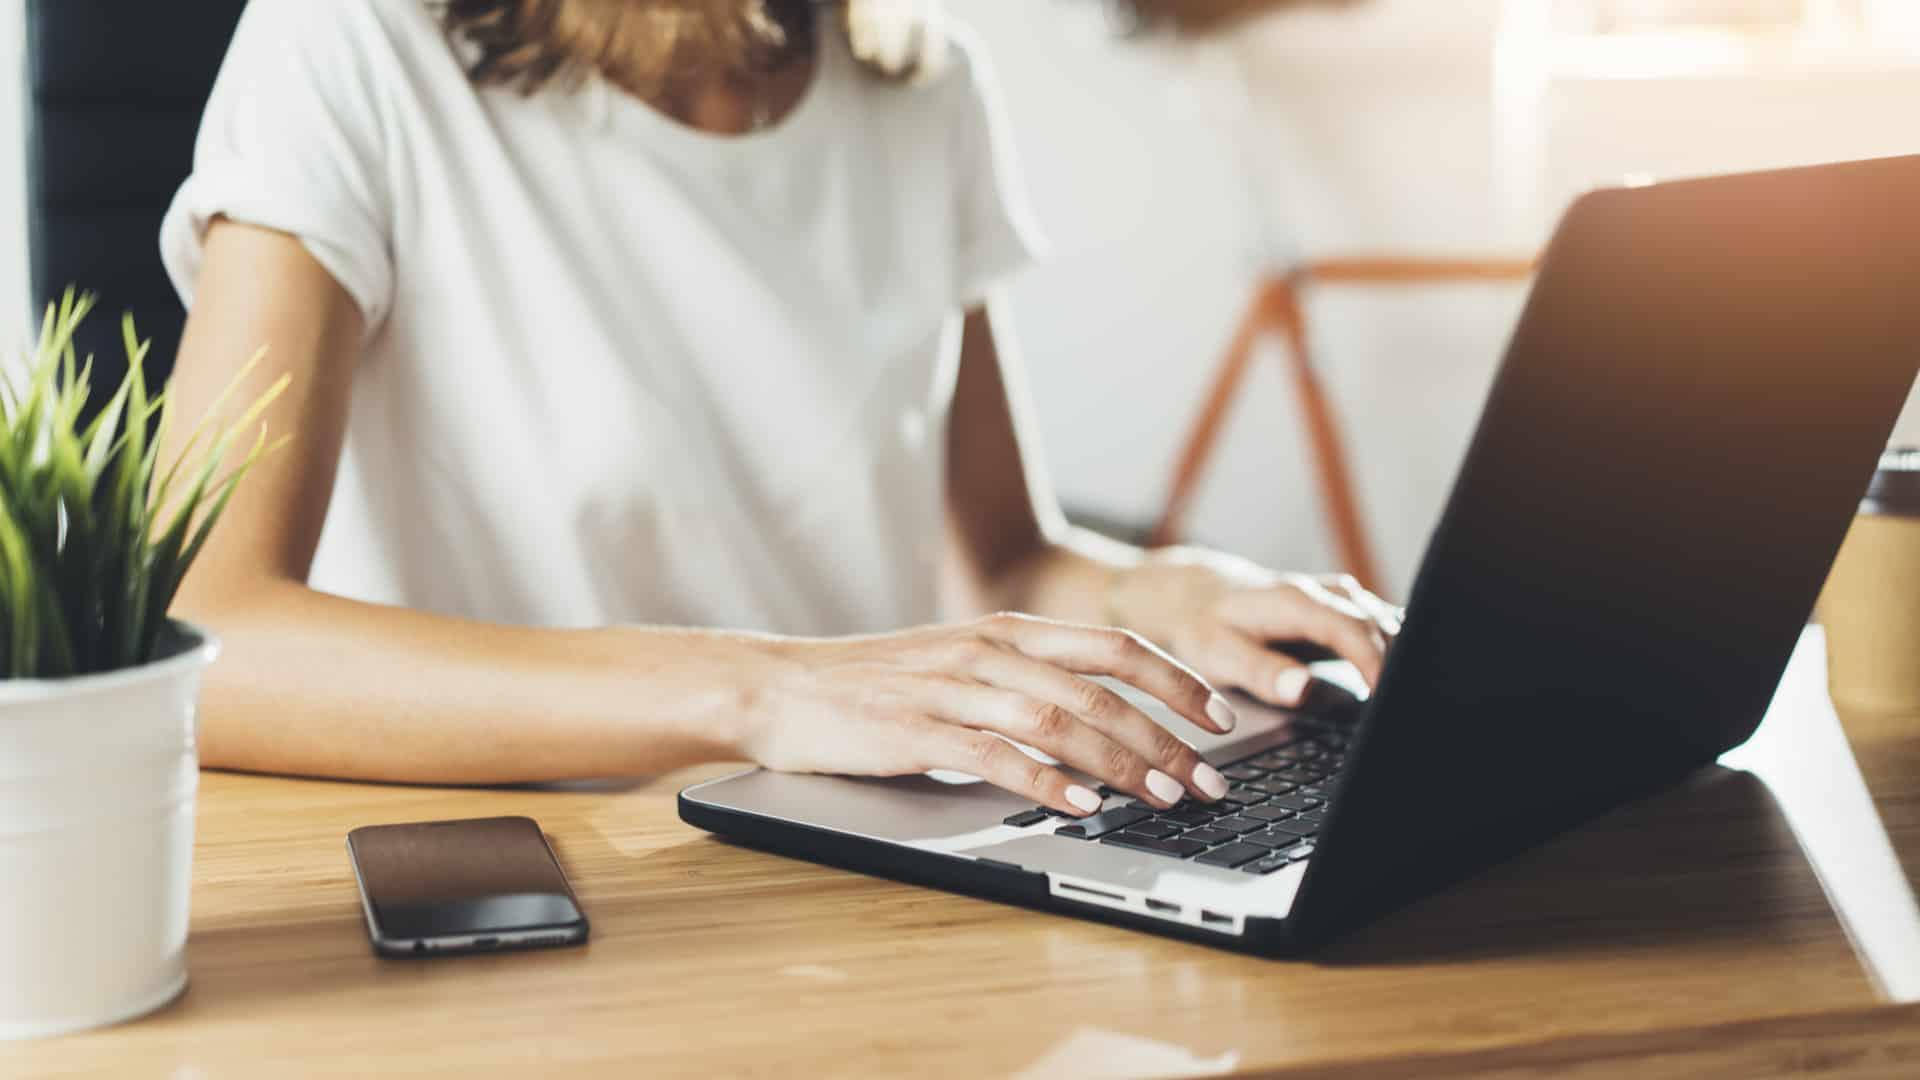 Escasez de laptops en 2021 BLOG LEASEIN